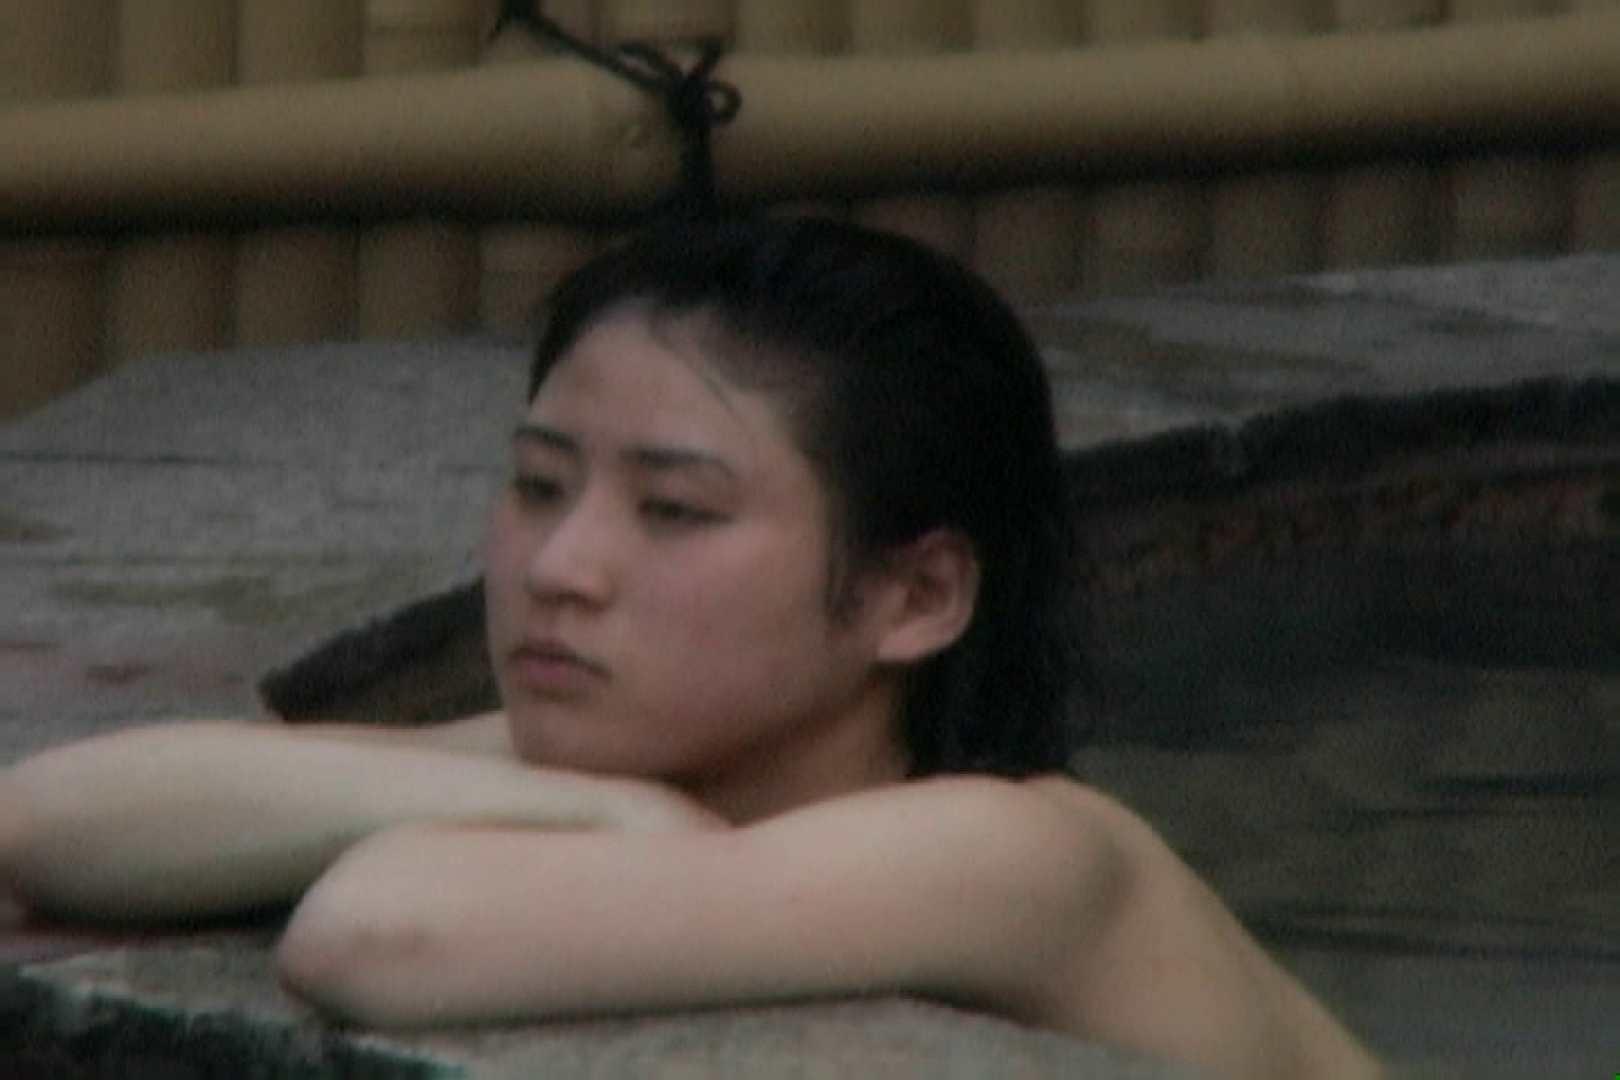 高画質露天女風呂観察 vol.004 望遠映像 すけべAV動画紹介 99PIX 77